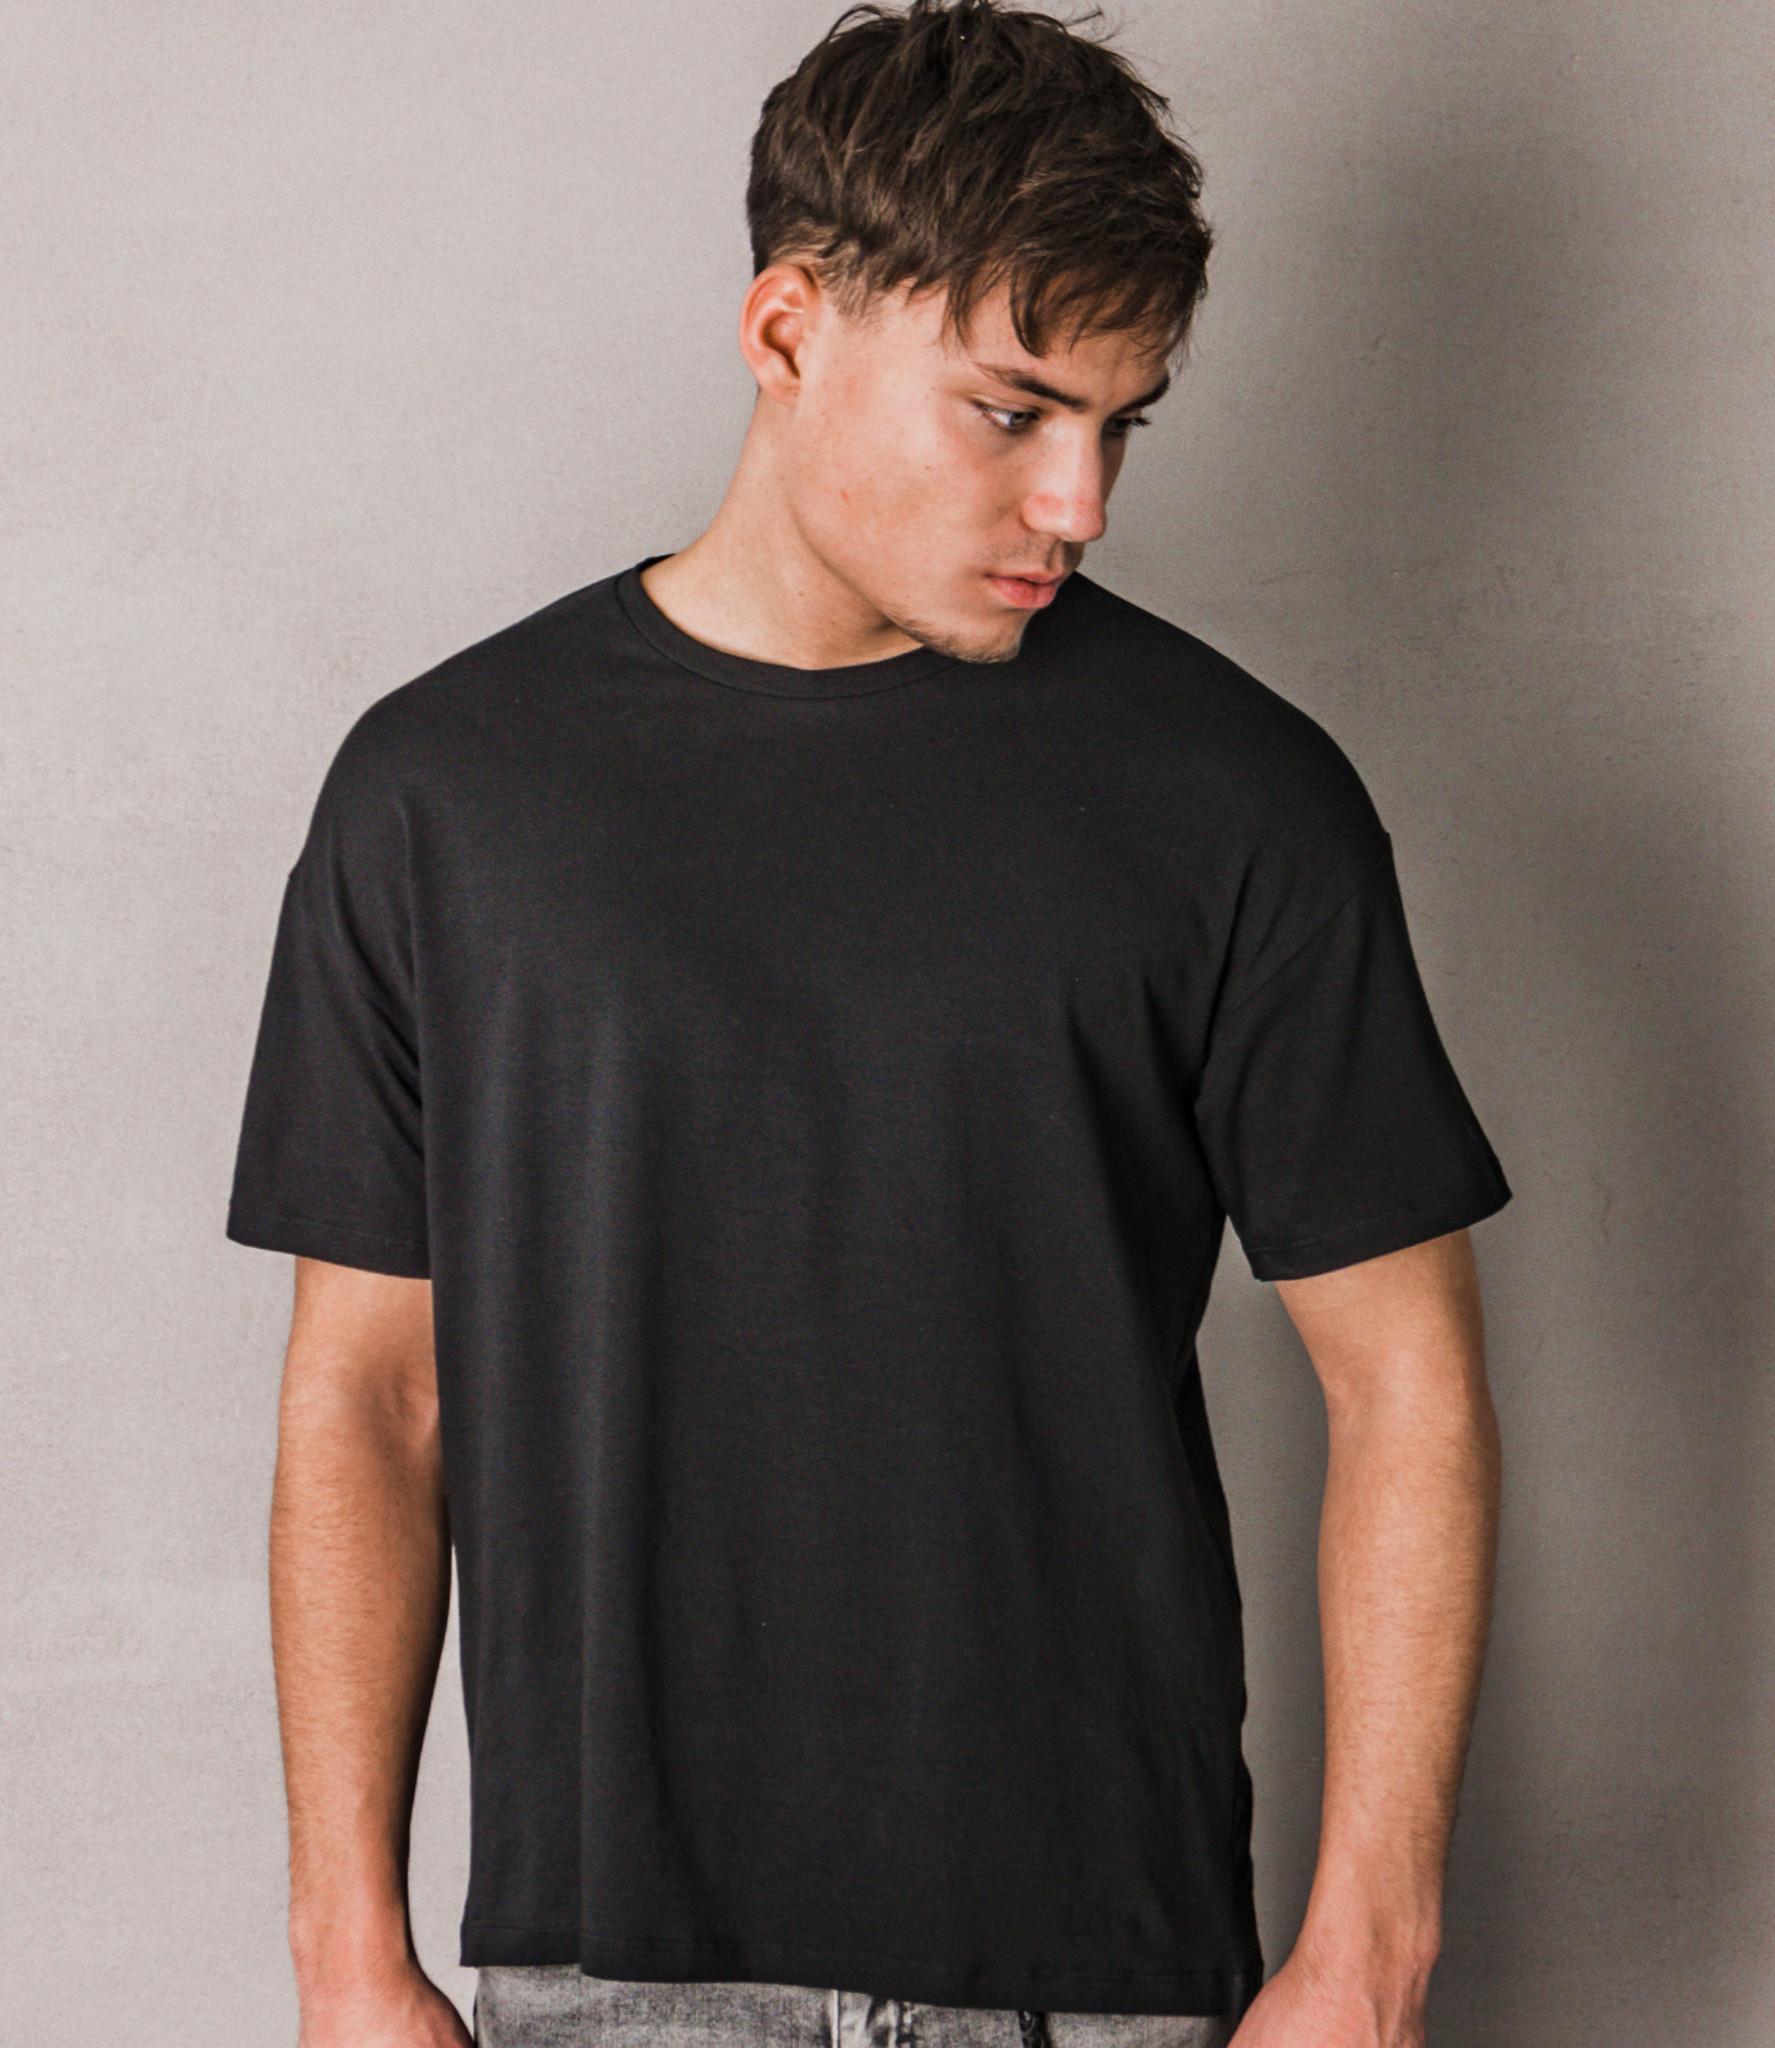 Monavoid Oversized TShirts DICIAMO Black